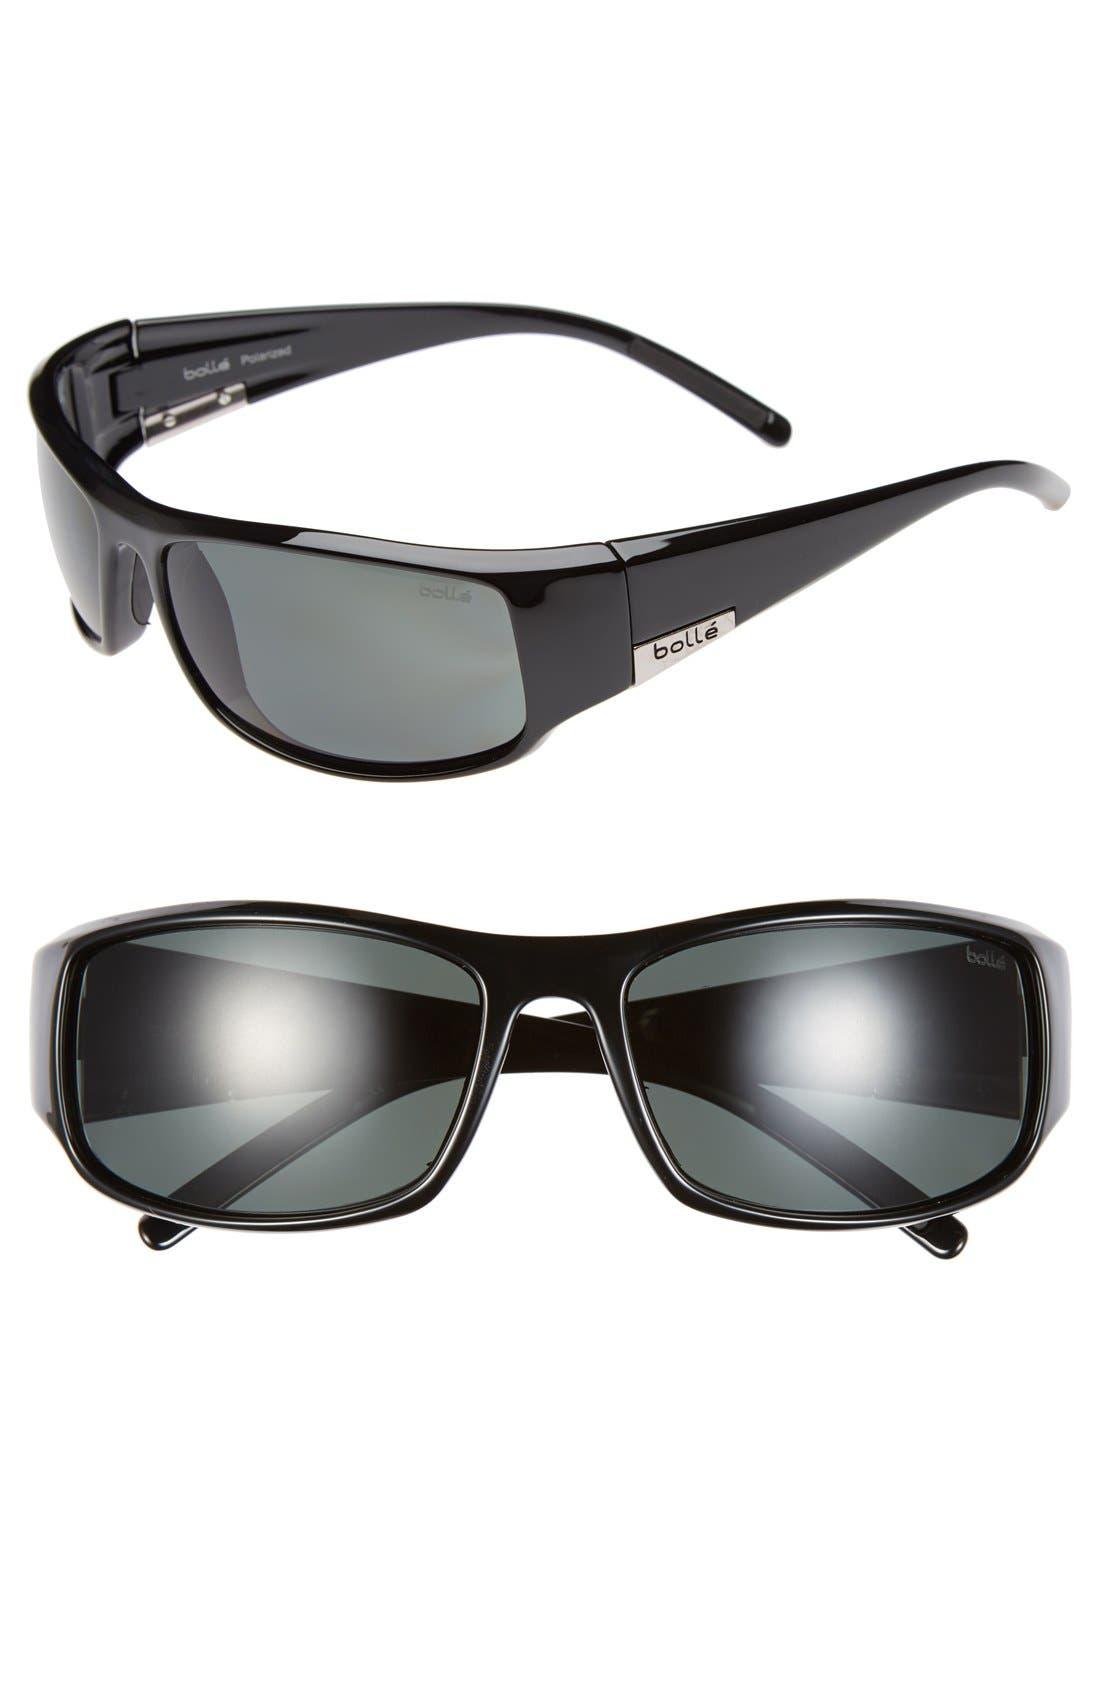 Alternate Image 1 Selected - Bolle 'King' 65mm Polarized Sport Sunglasses